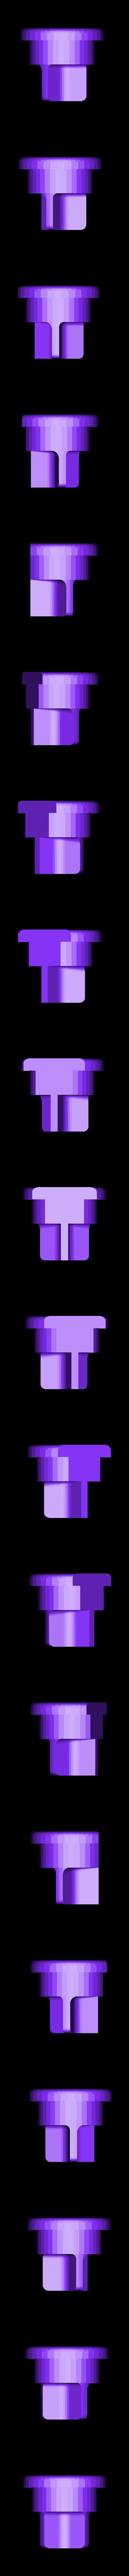 Feederbot_Adapter.stl Download free STL file Feederbot spool adapter • 3D print template, Gaenarra